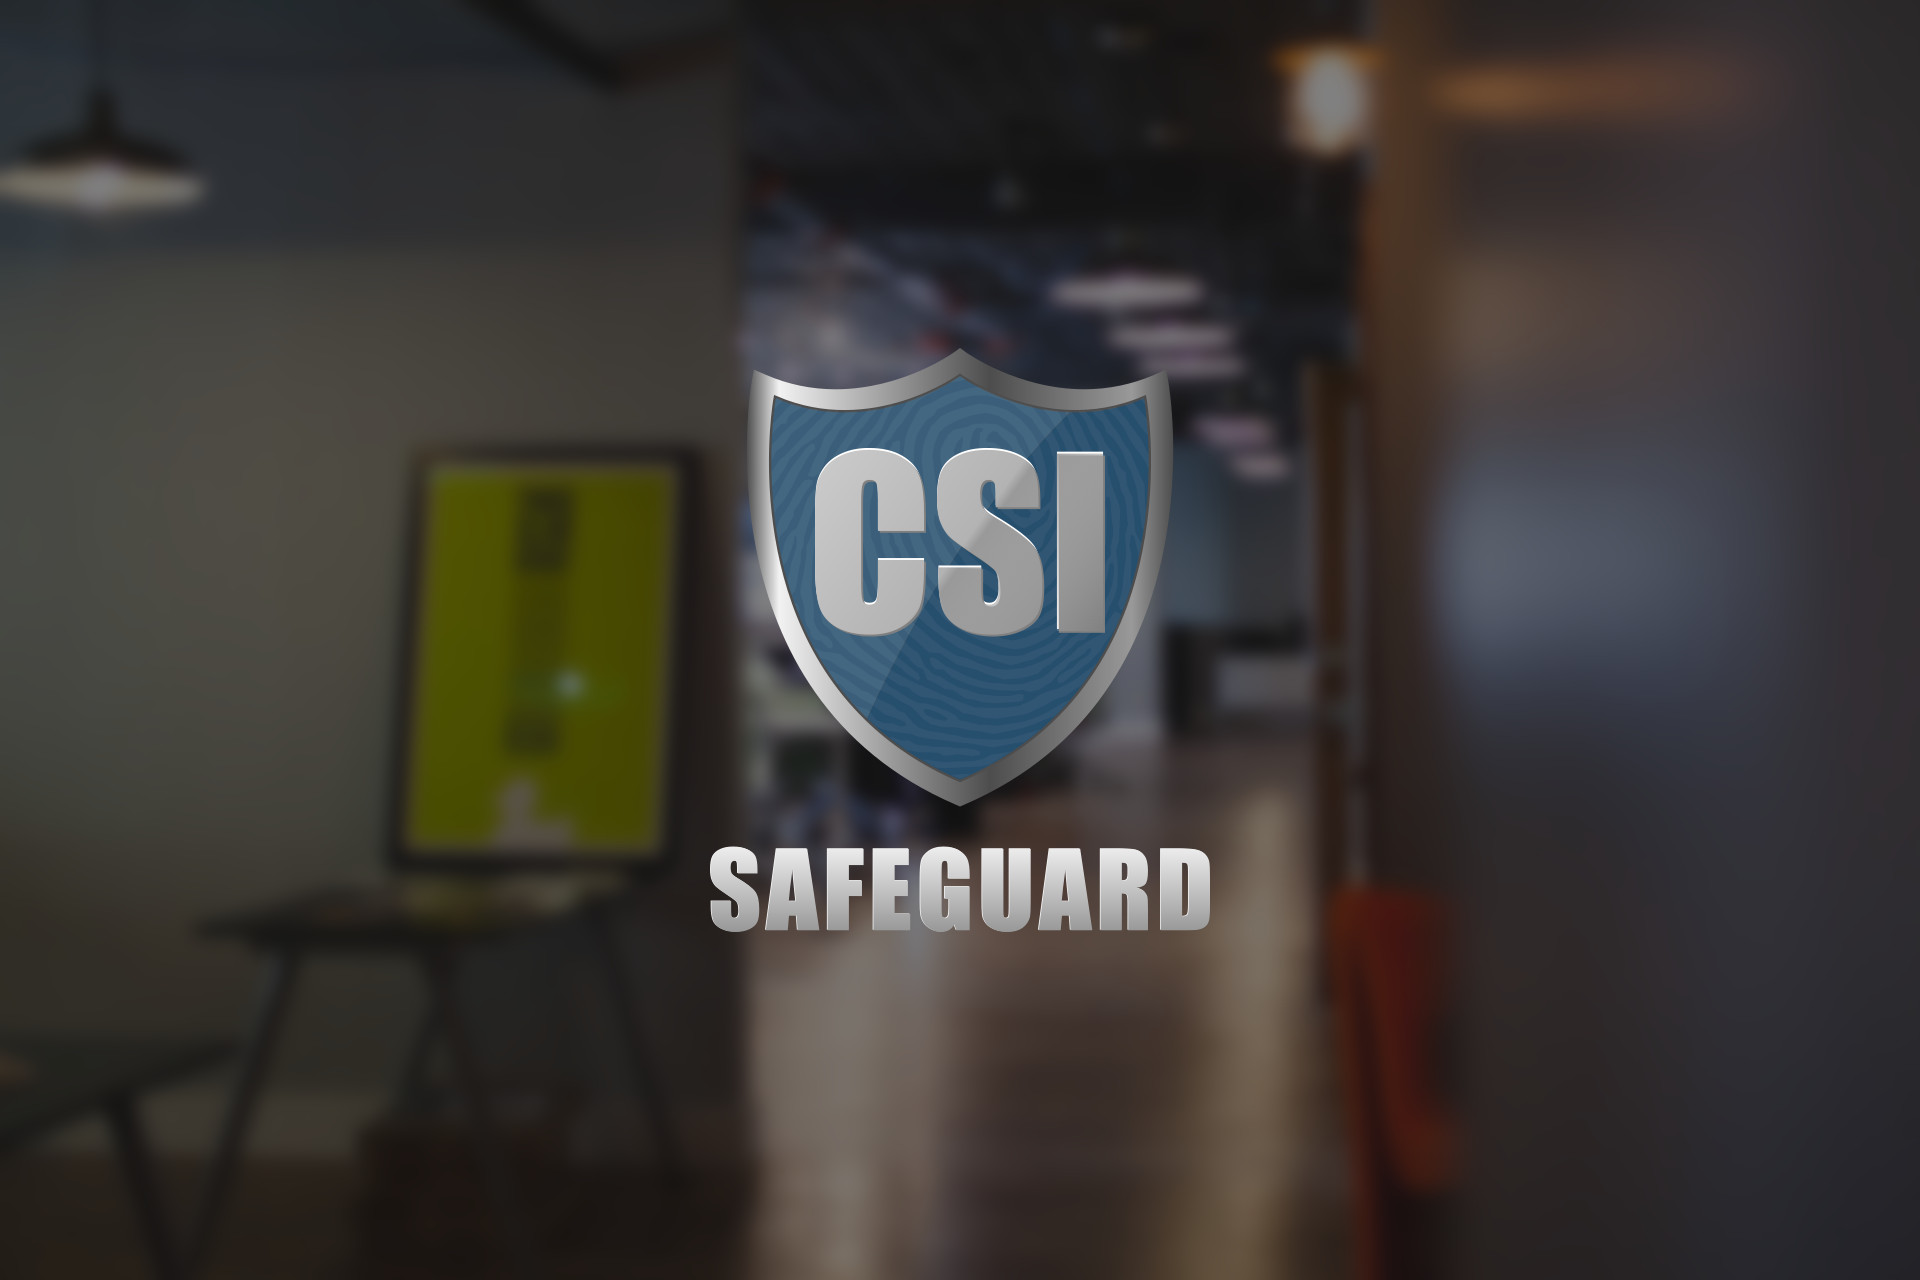 CSI Safeguard - Pre-employment Screening